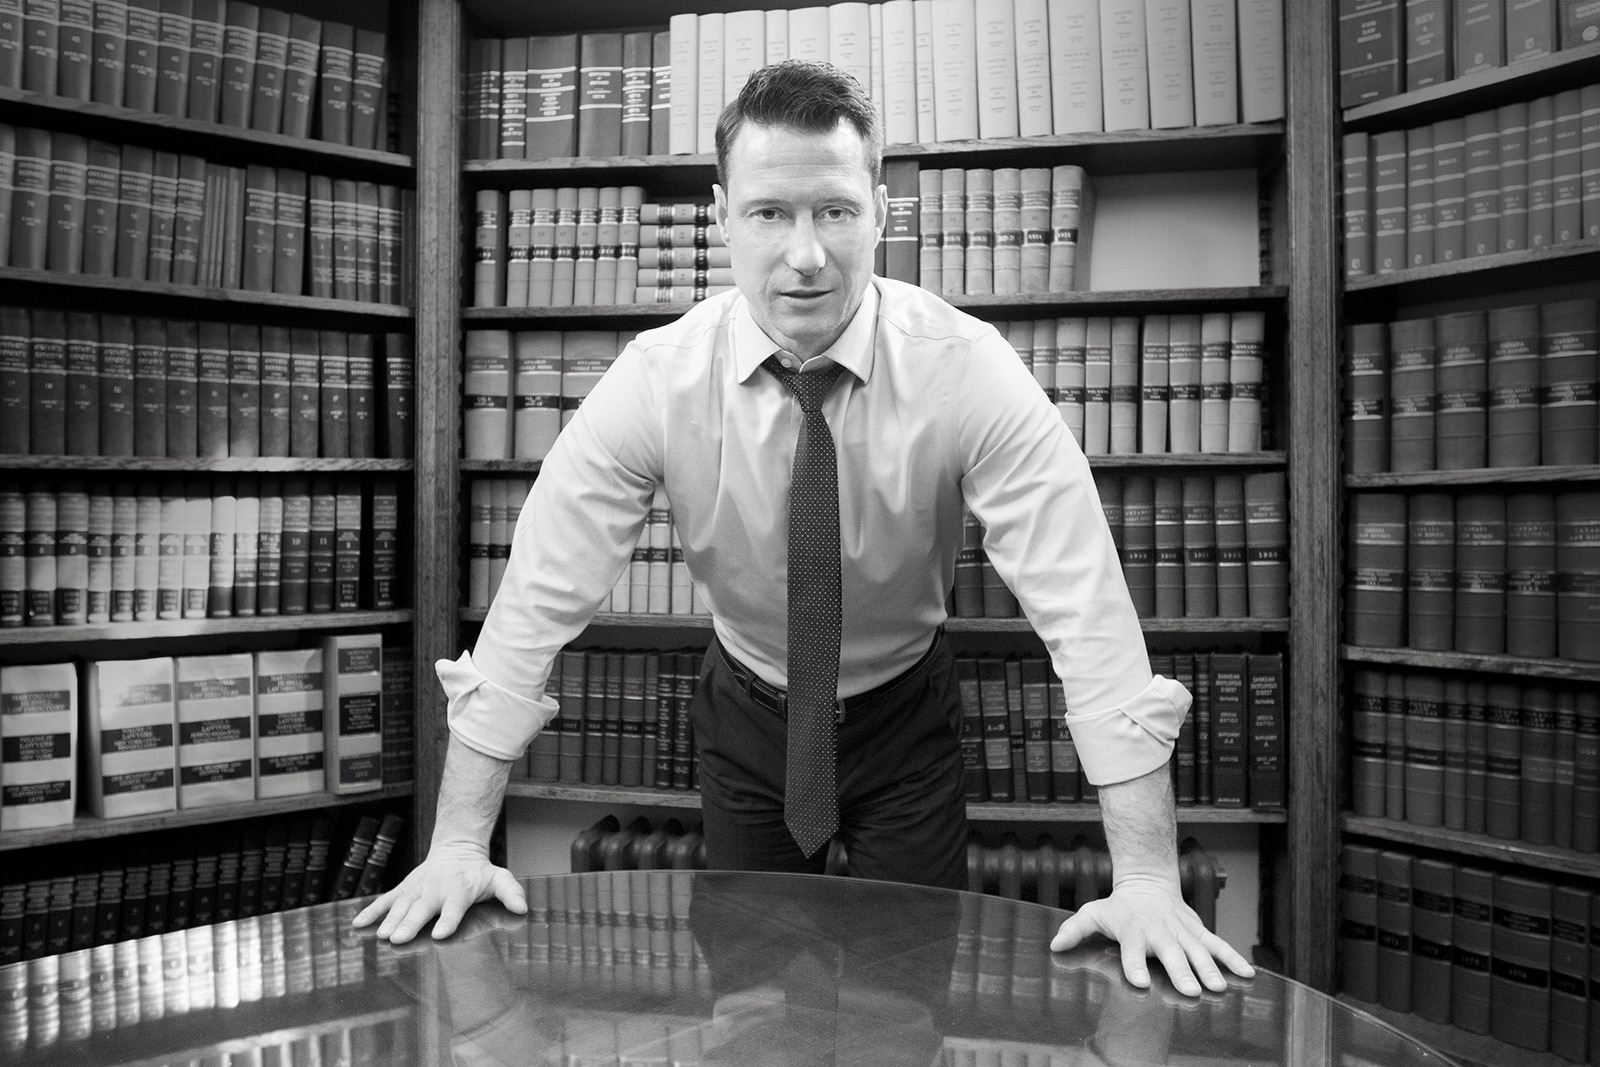 Mark Hogan criminal lawyer in Mississauga